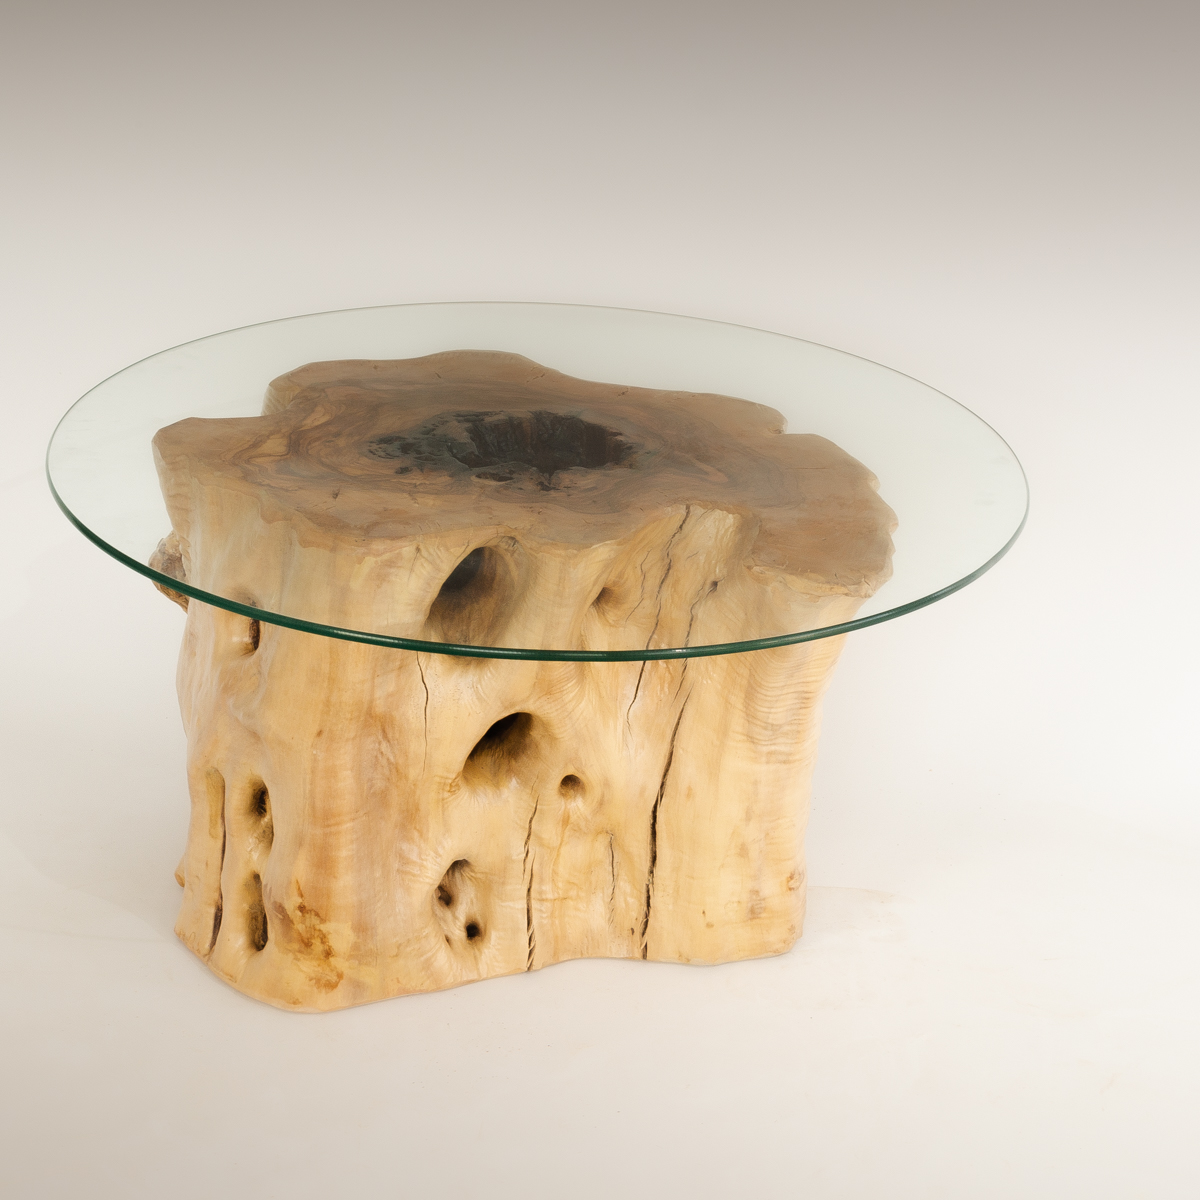 Mesa de Olivo de tronco natural de 37x50x55 | MiRococo.com